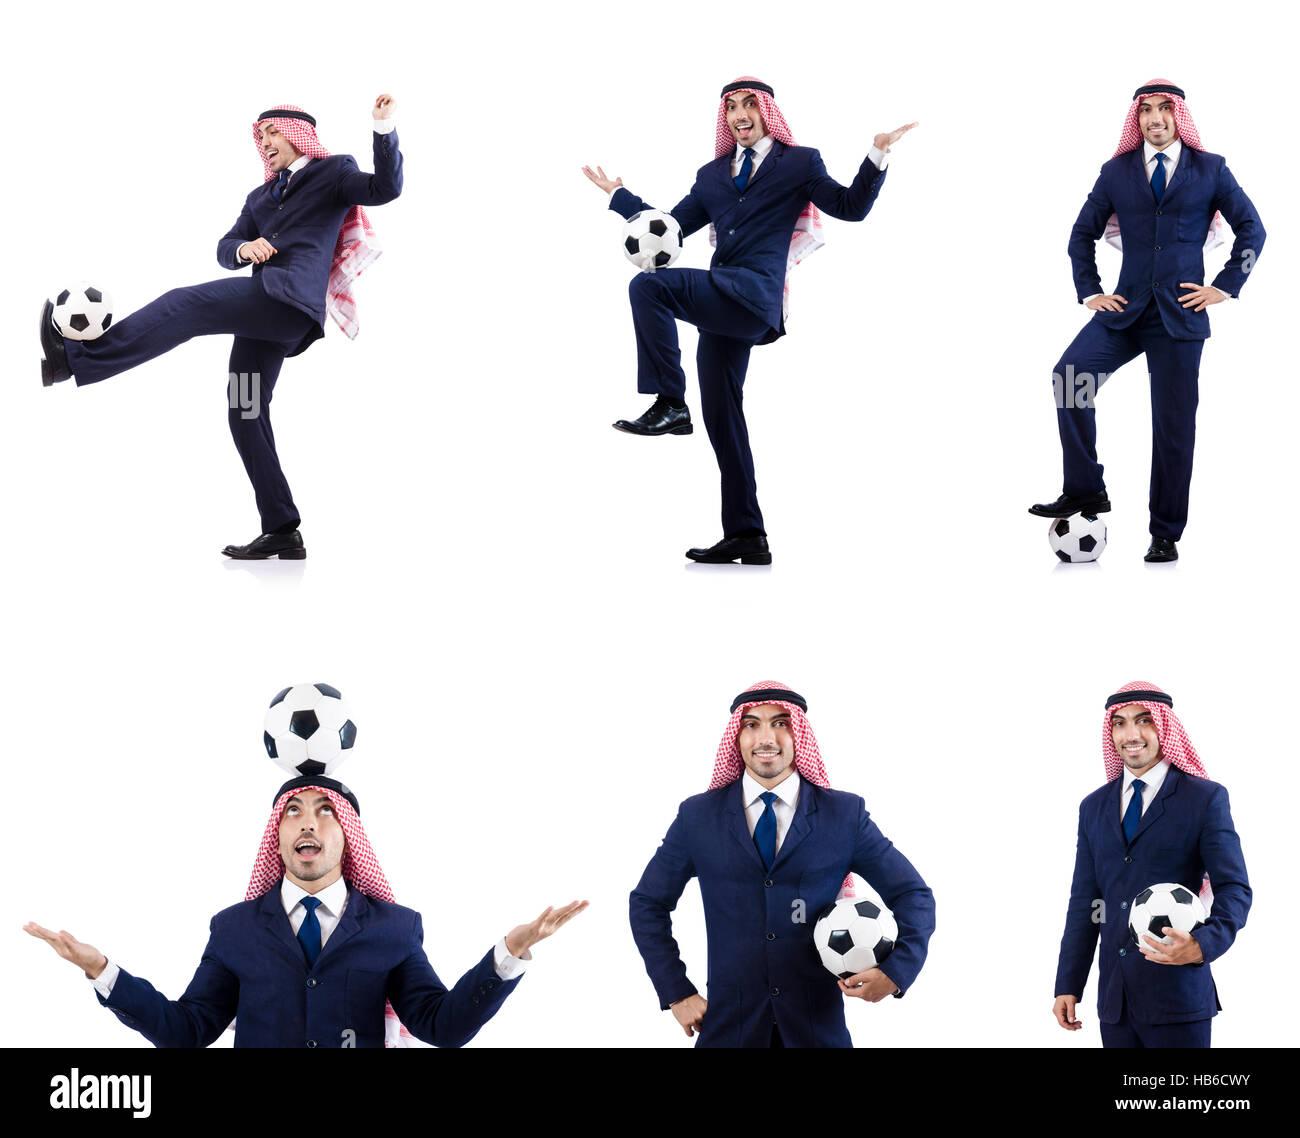 Arab businessman with football - Stock Image